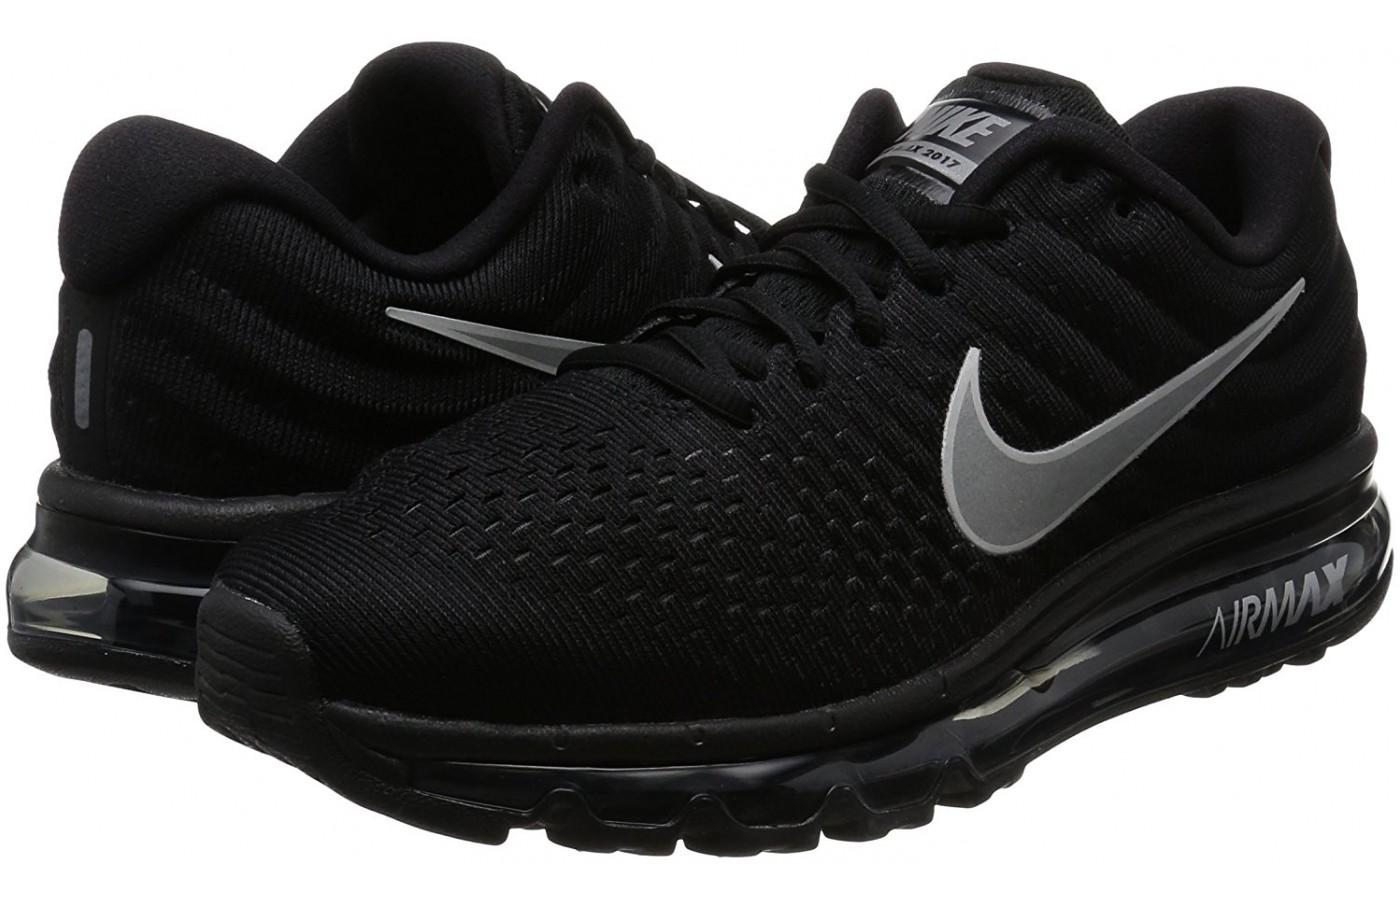 Air max 2017 pair